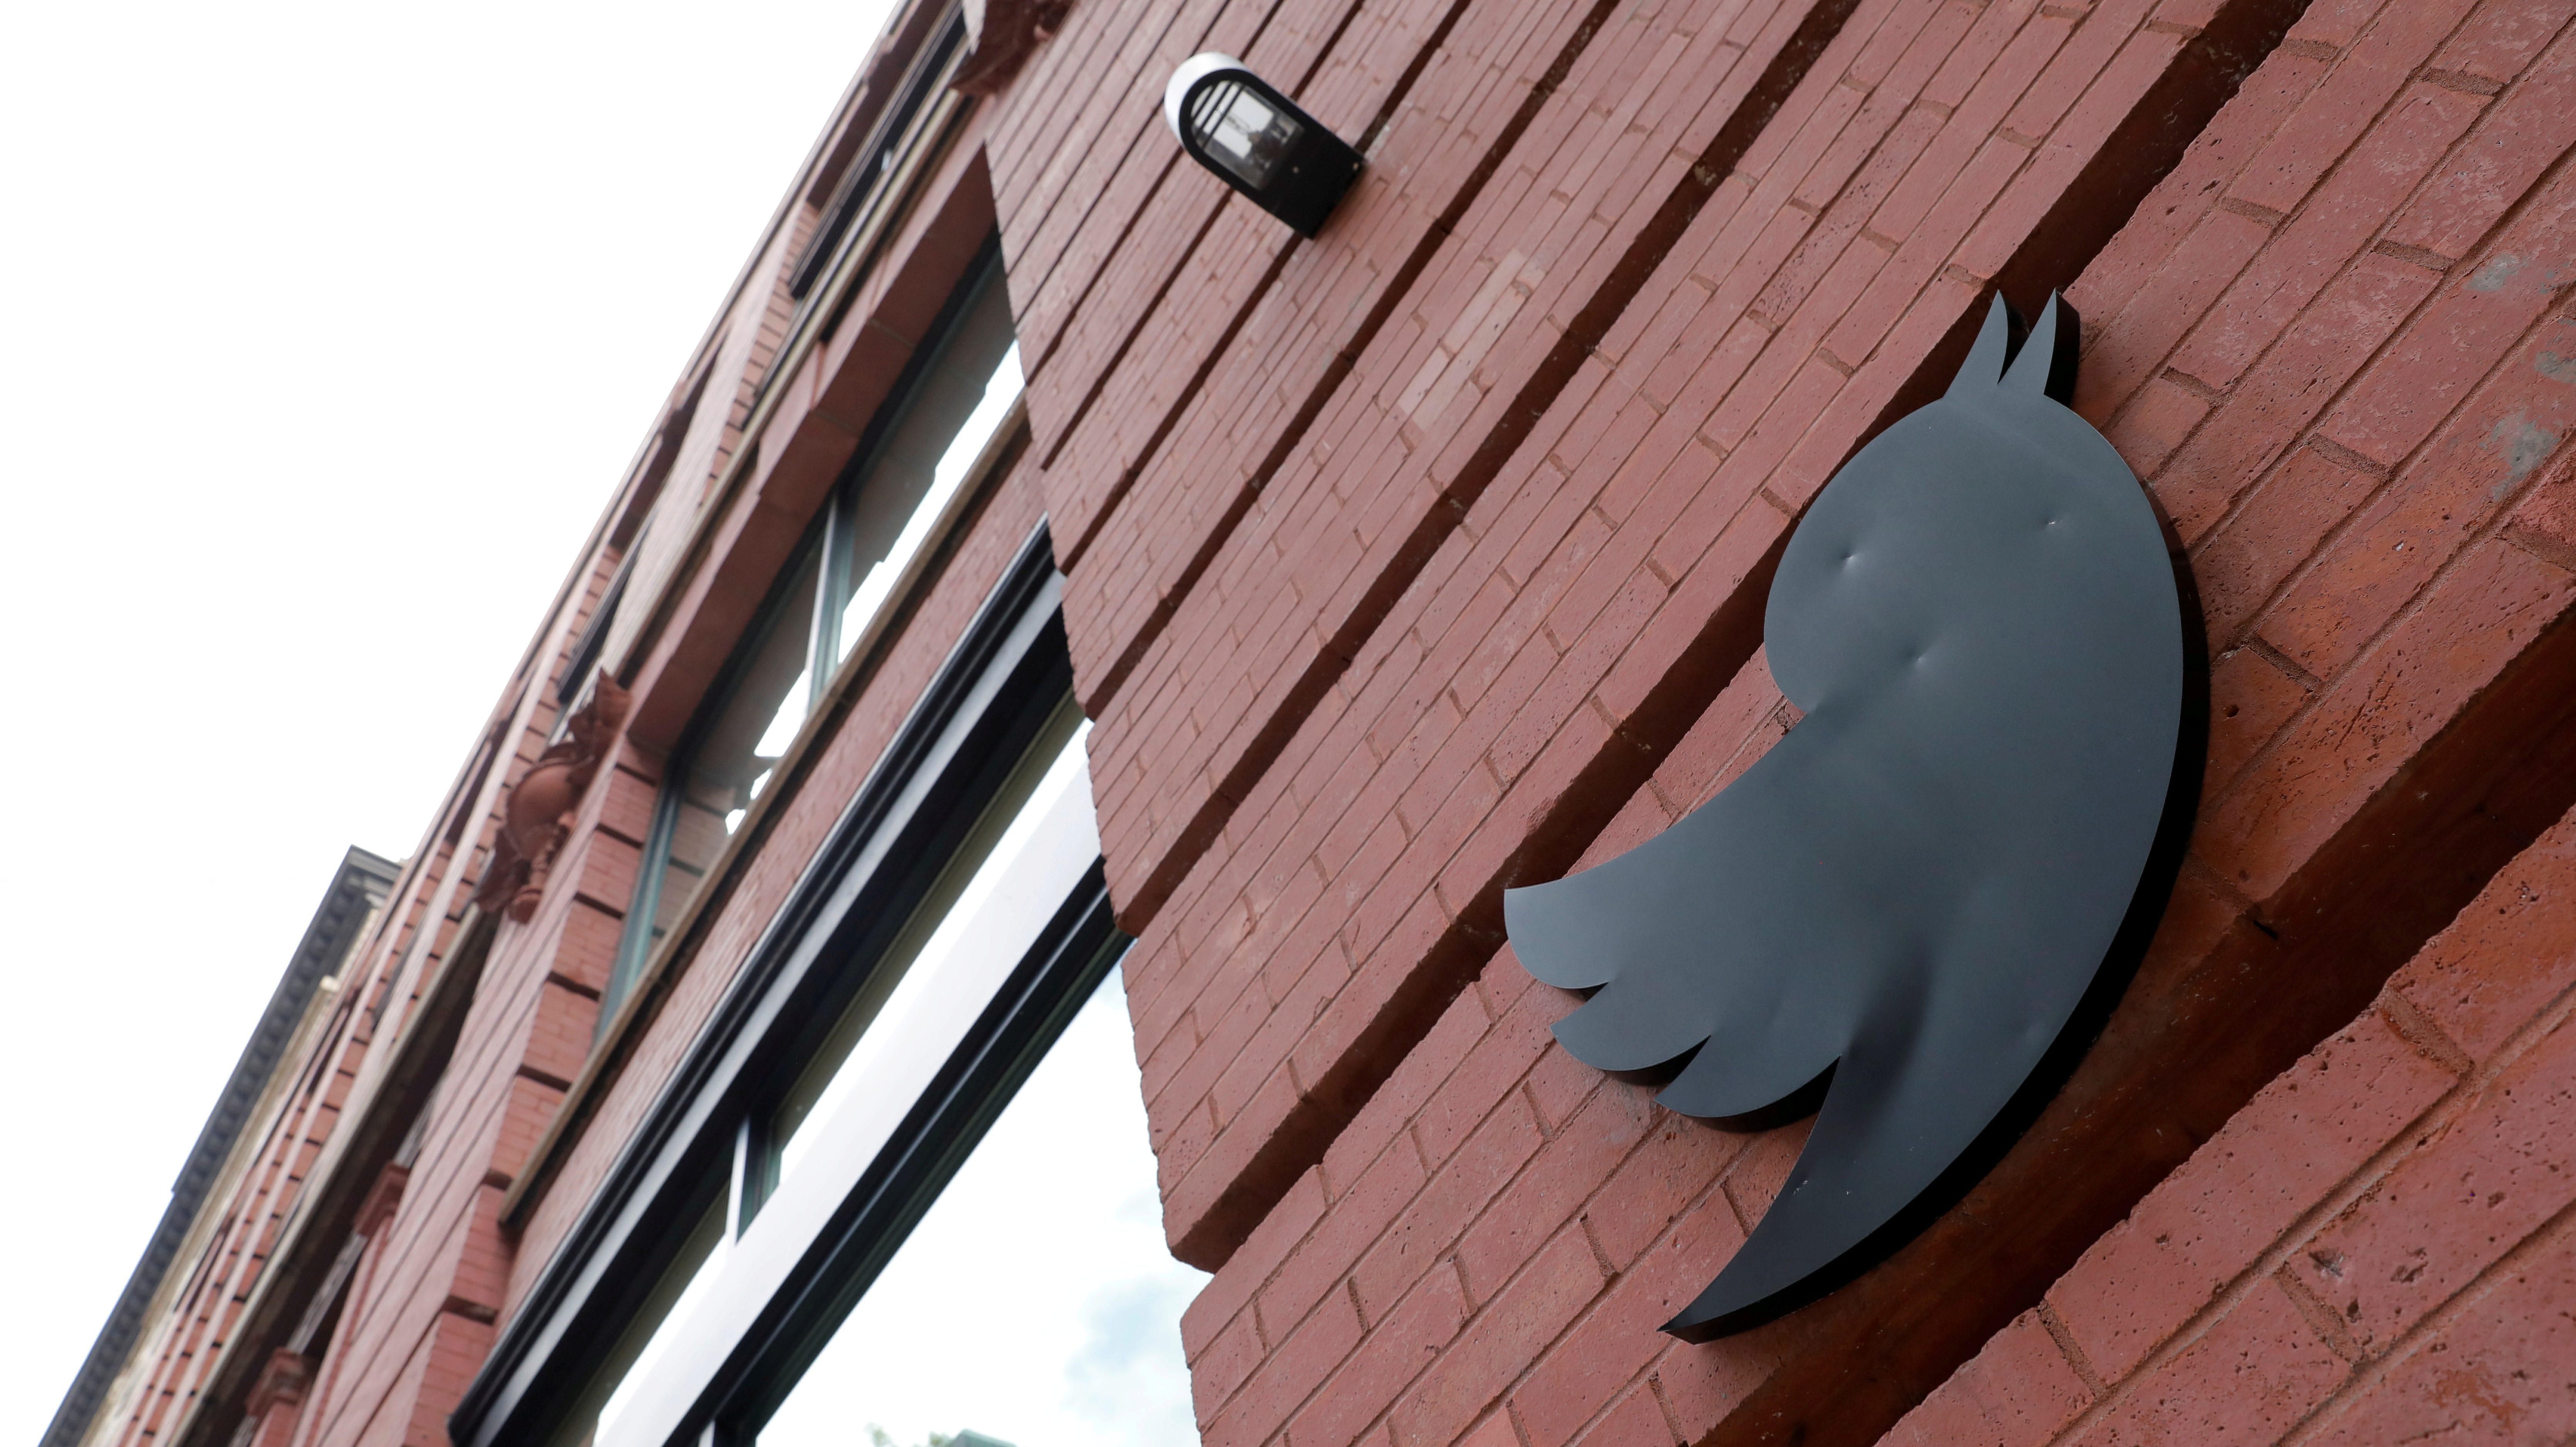 Twitter's New York offices